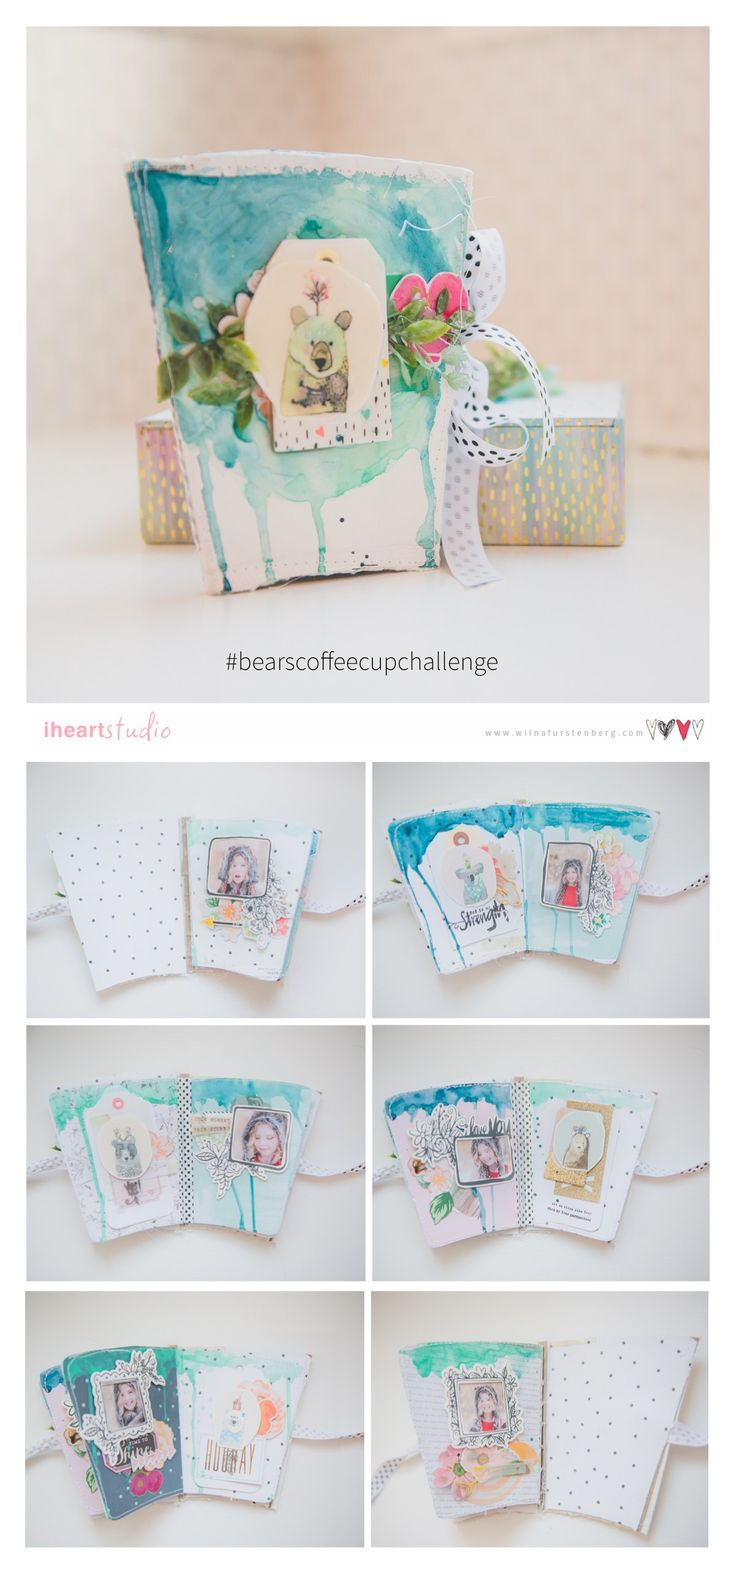 Diy mini album scrapbook for boyfriend 2014 youtube - Coffee Cup Album Challenge